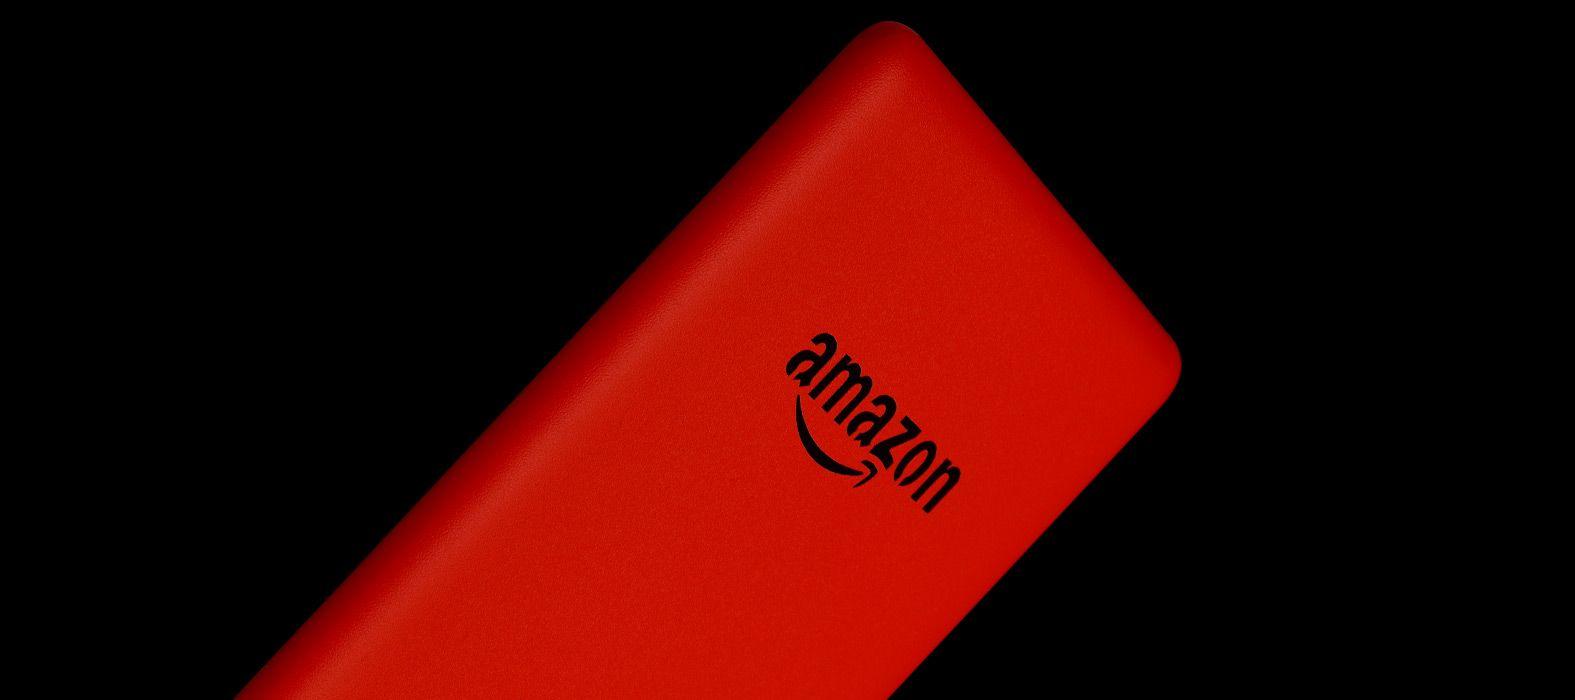 Amazon-Kindle-Red-Sandstone-Skins